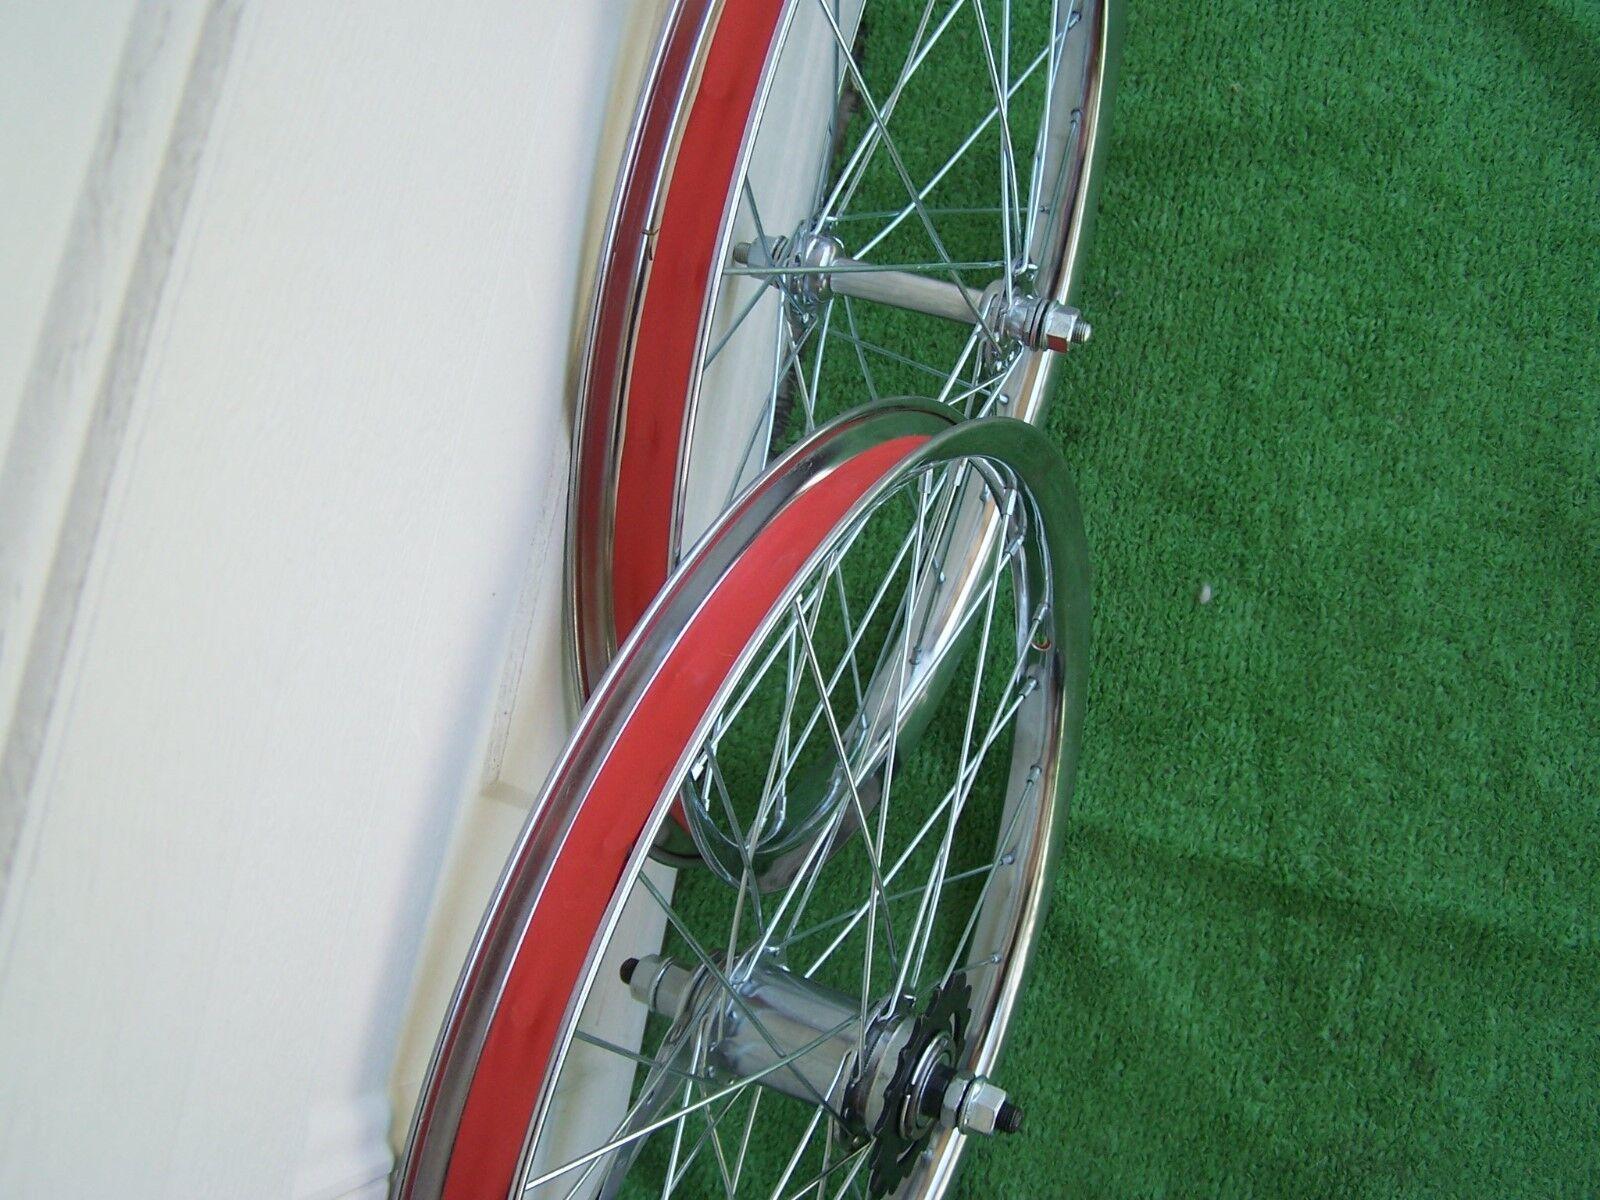 Par De 20 X 175/2.125 Whee Acero Cromo Montaña Bicicleta Whee 175/2.125 Set Freno Frontal Nuevo 961a15